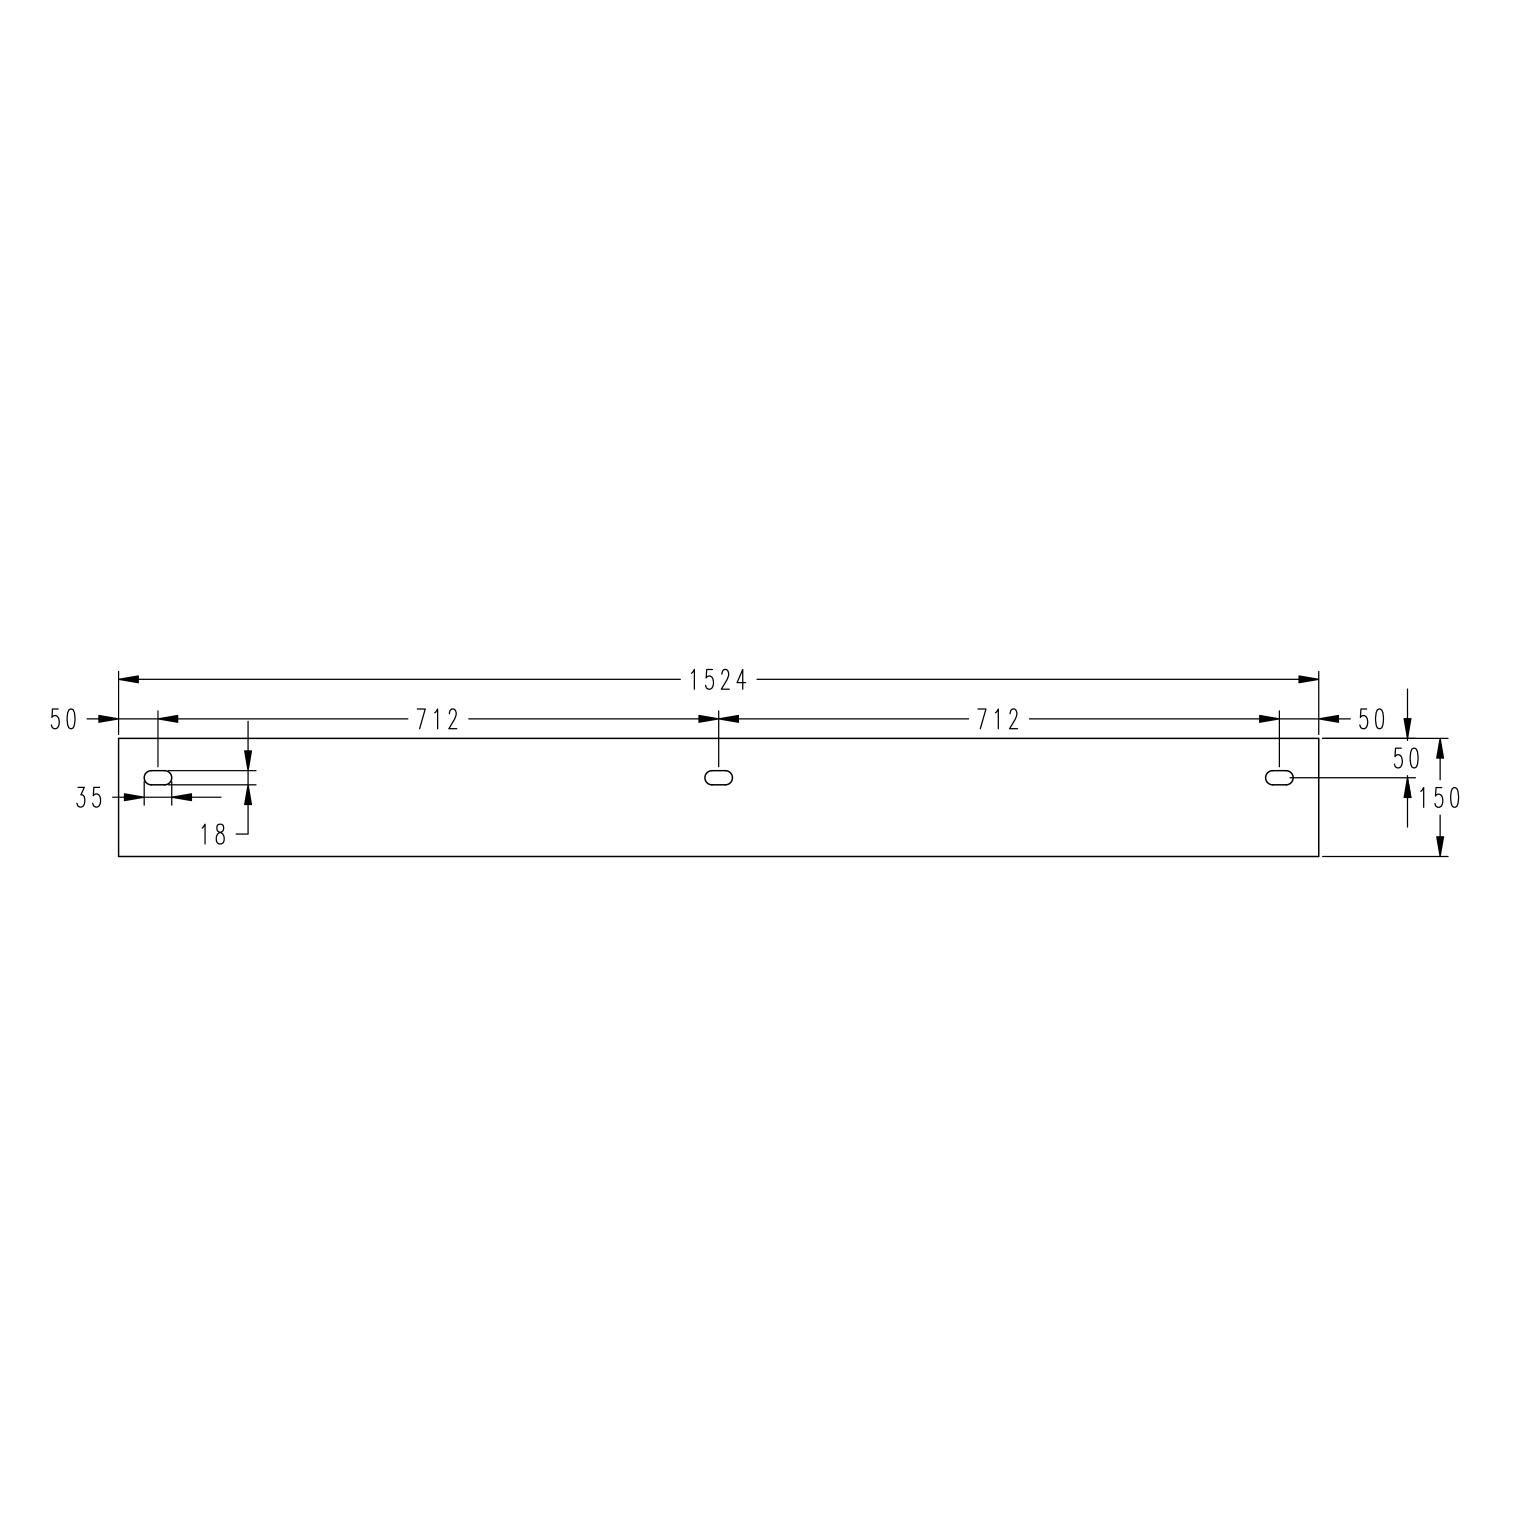 Washbasin TWG231 153cm - Drawing 4